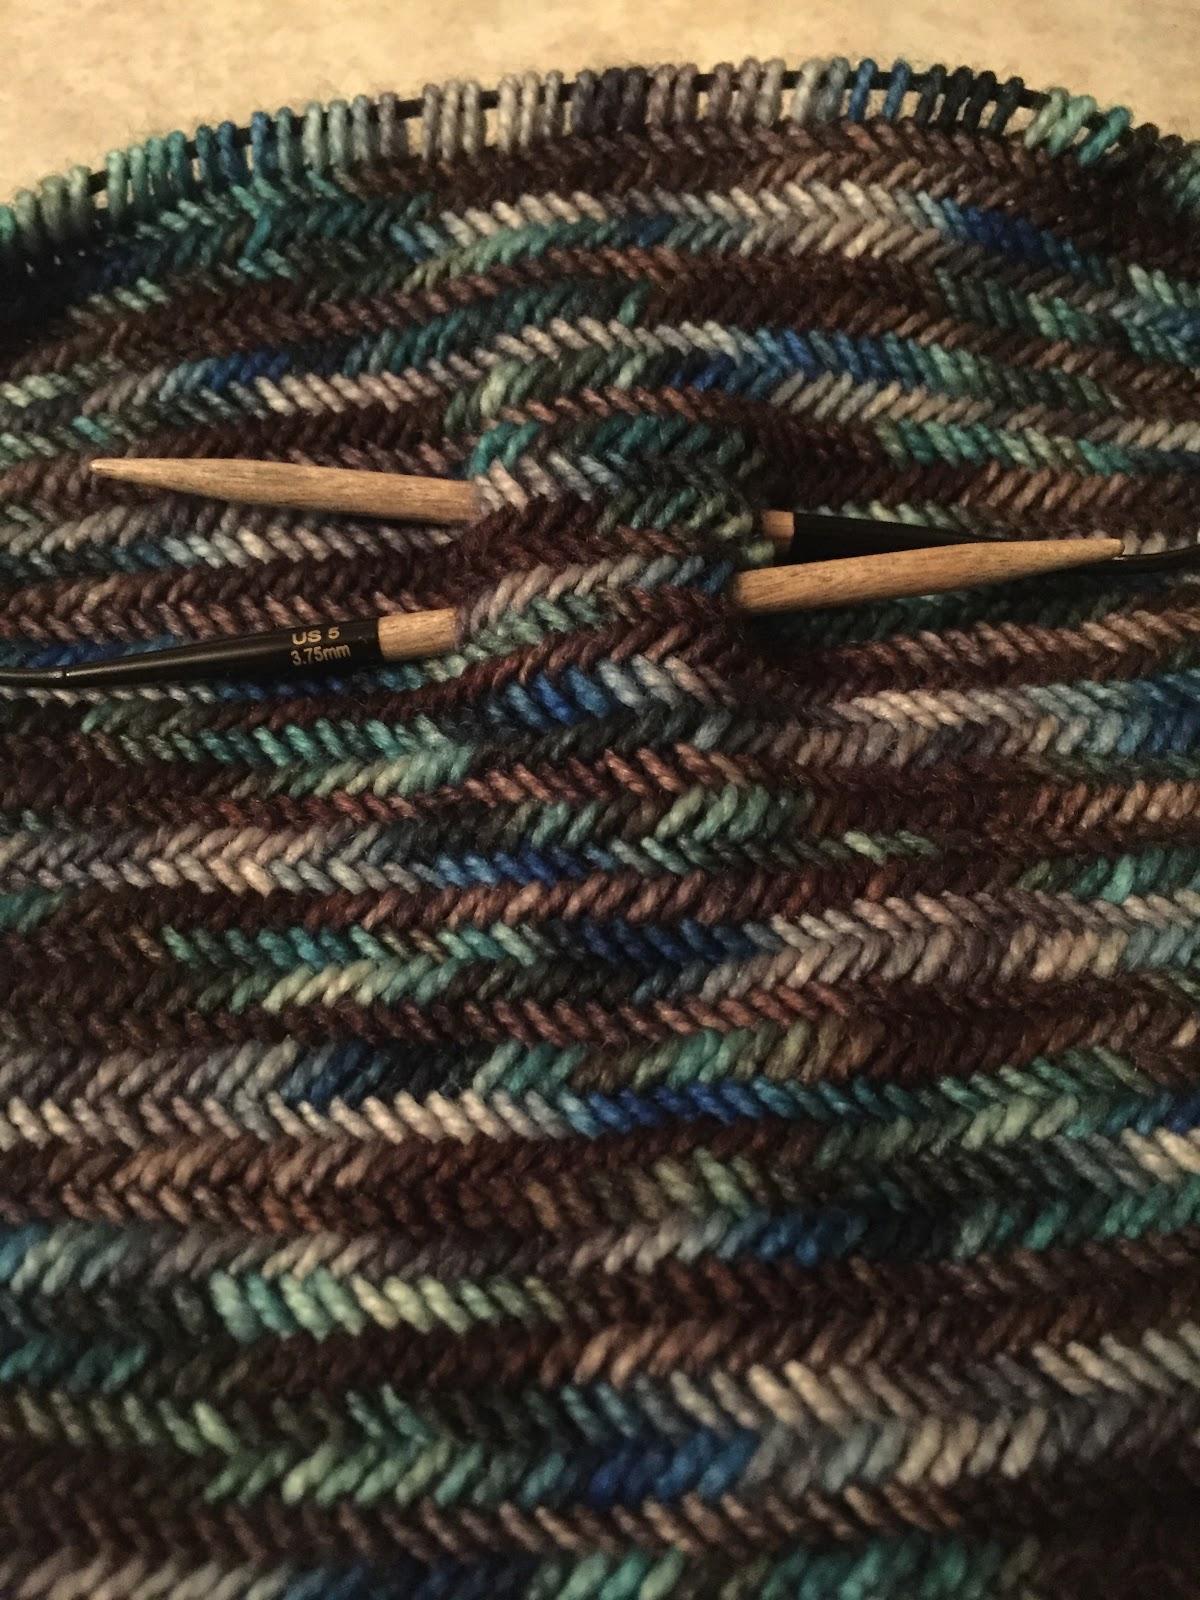 The Dragon S Shelf Lykke Needle Review